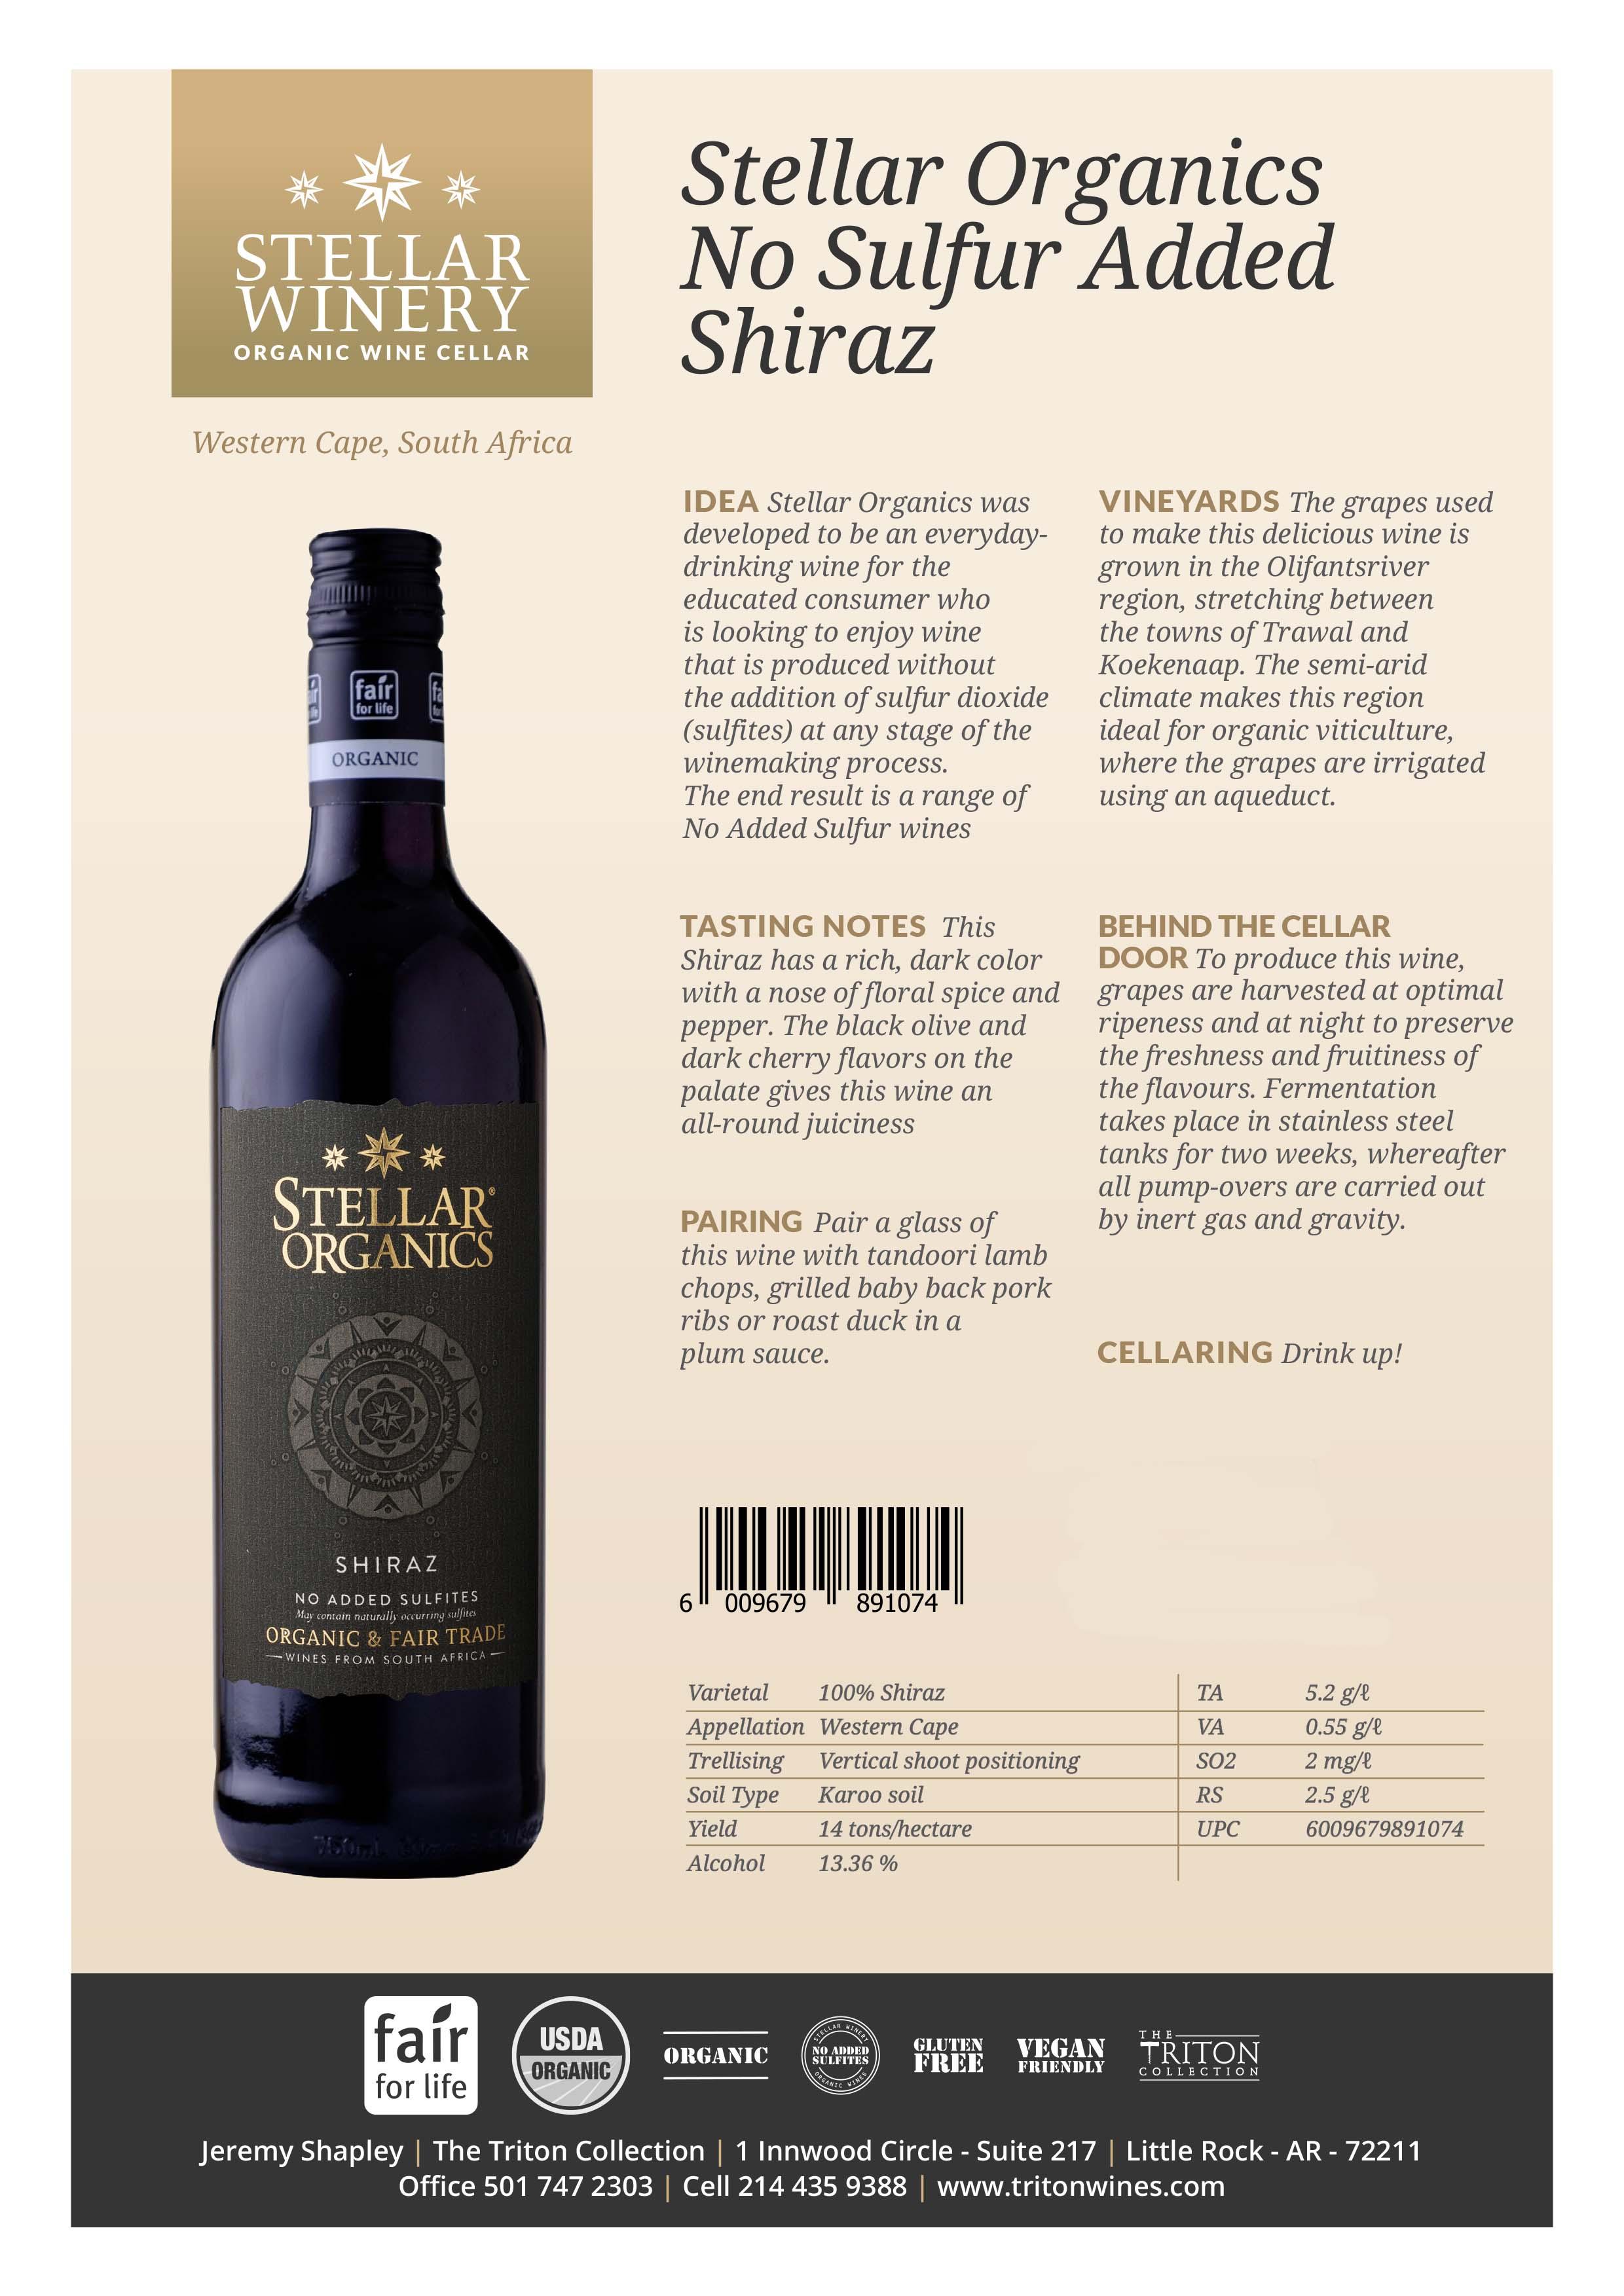 Stellar Organics Shiraz Tech Sheet